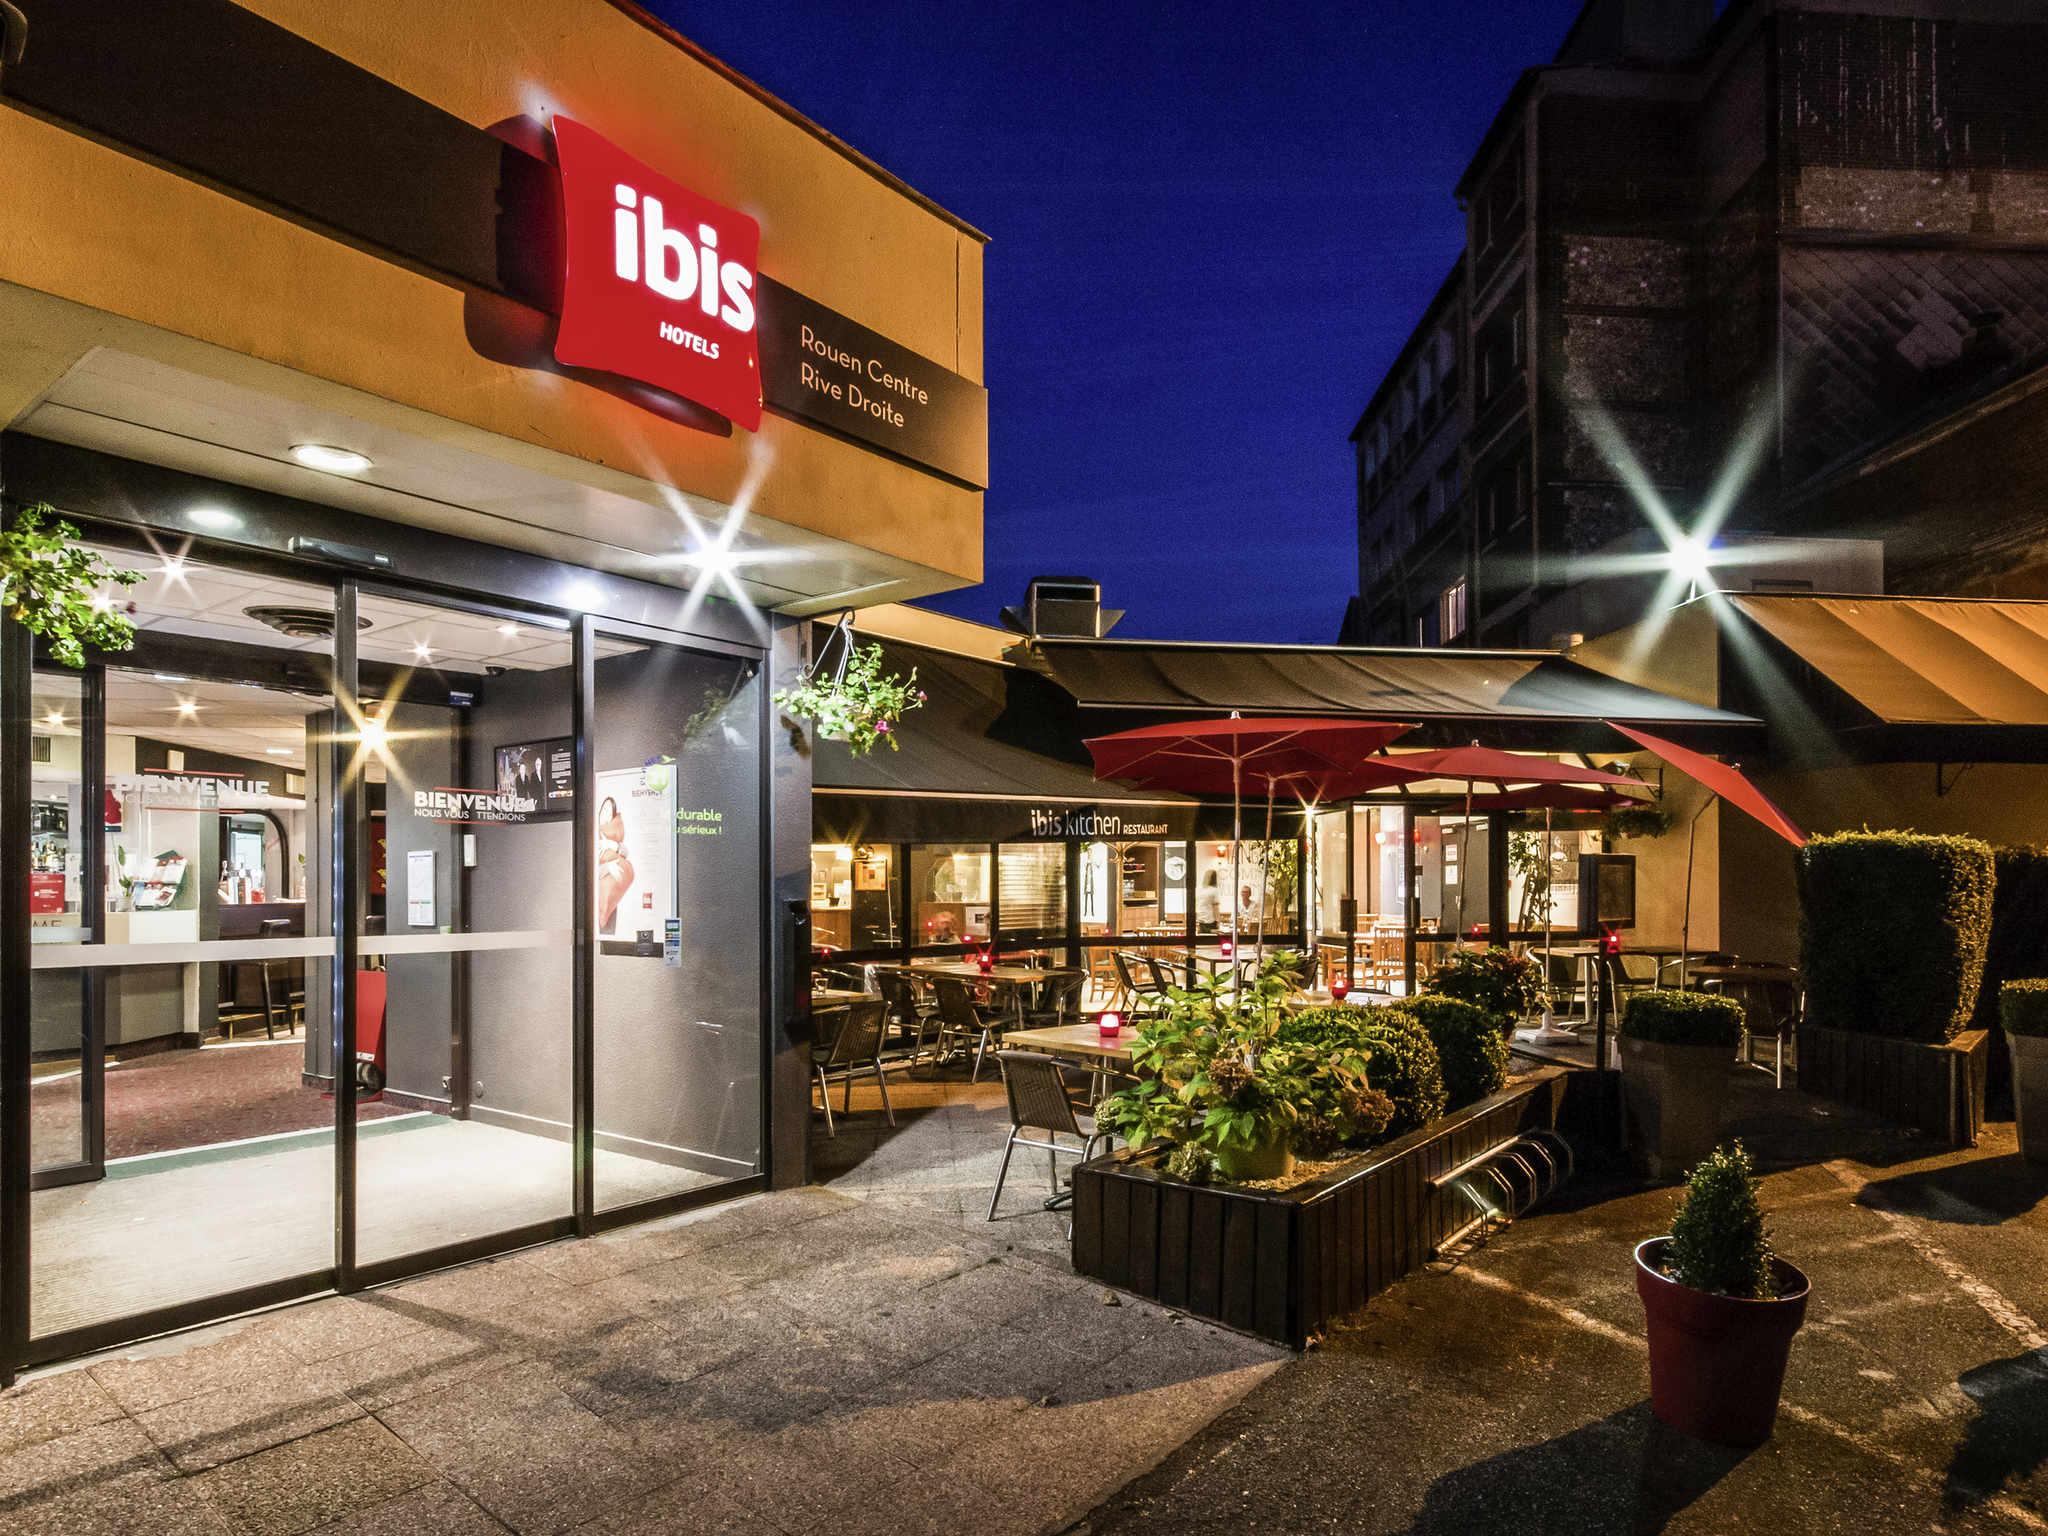 Hotel - ibis Rouen Centre Rive Droite